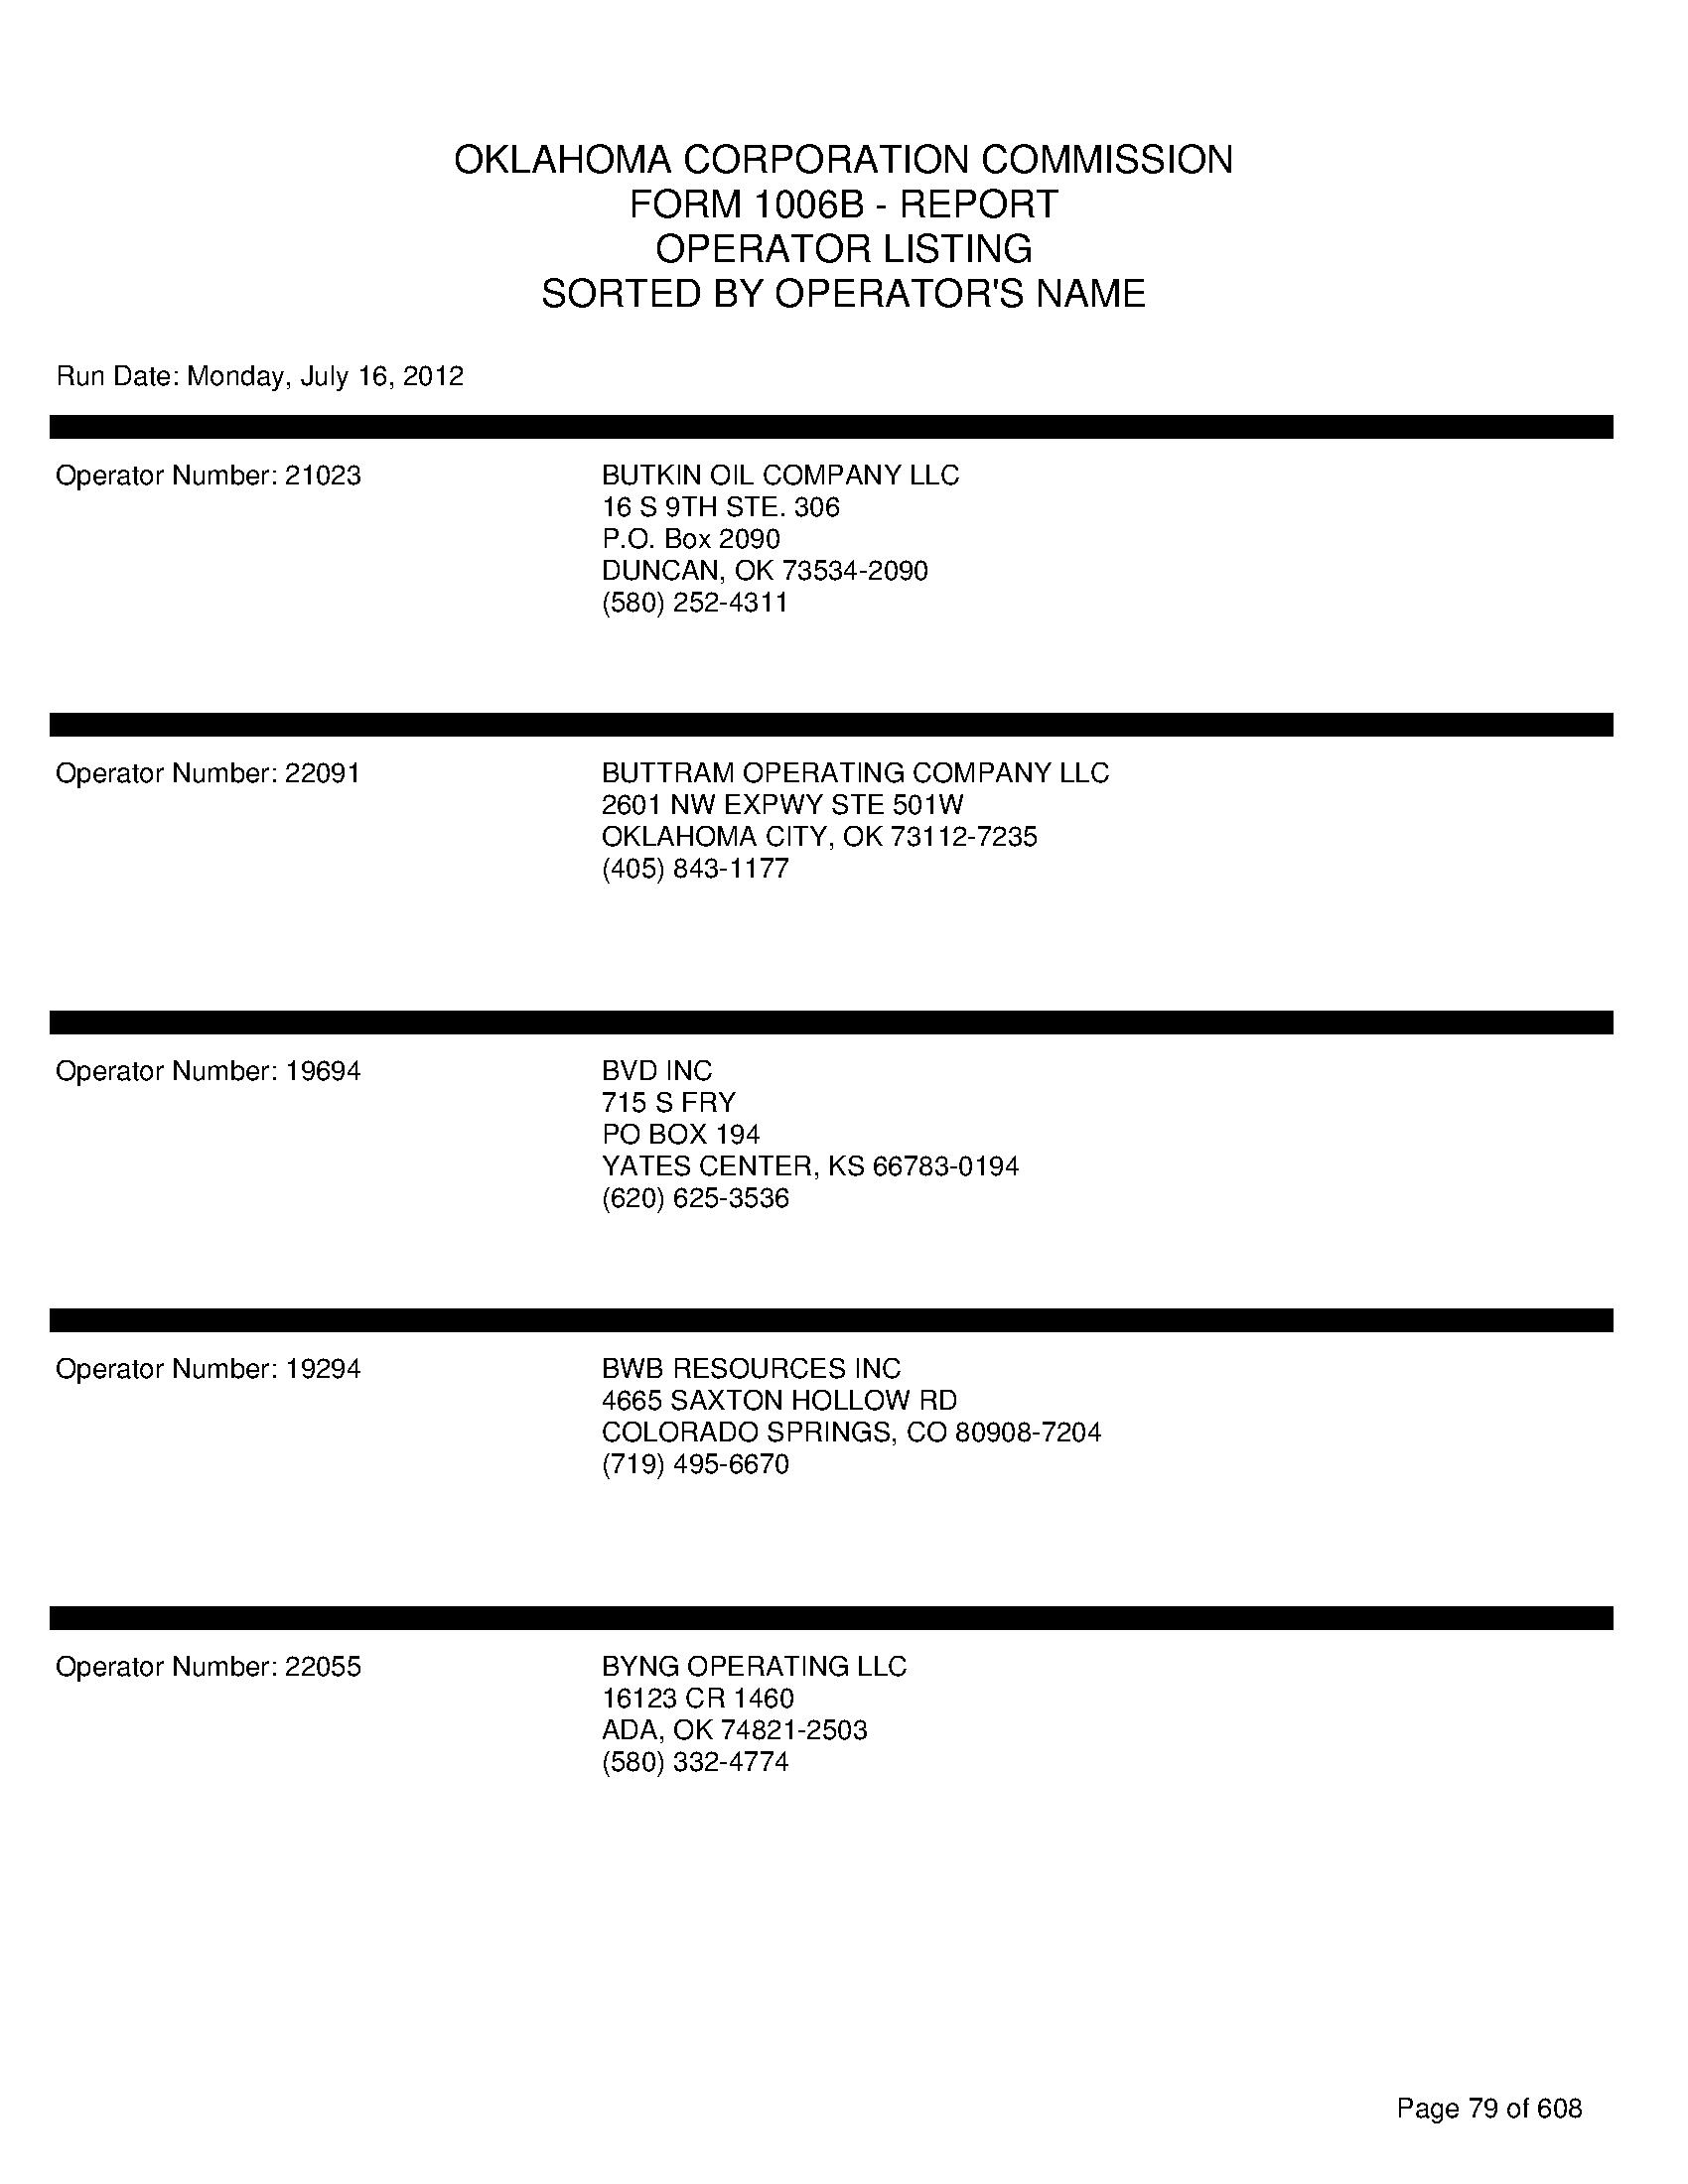 r97oper 79 documents ok gov oklahoma digital prairie documents images and information documents ok gov oklahoma